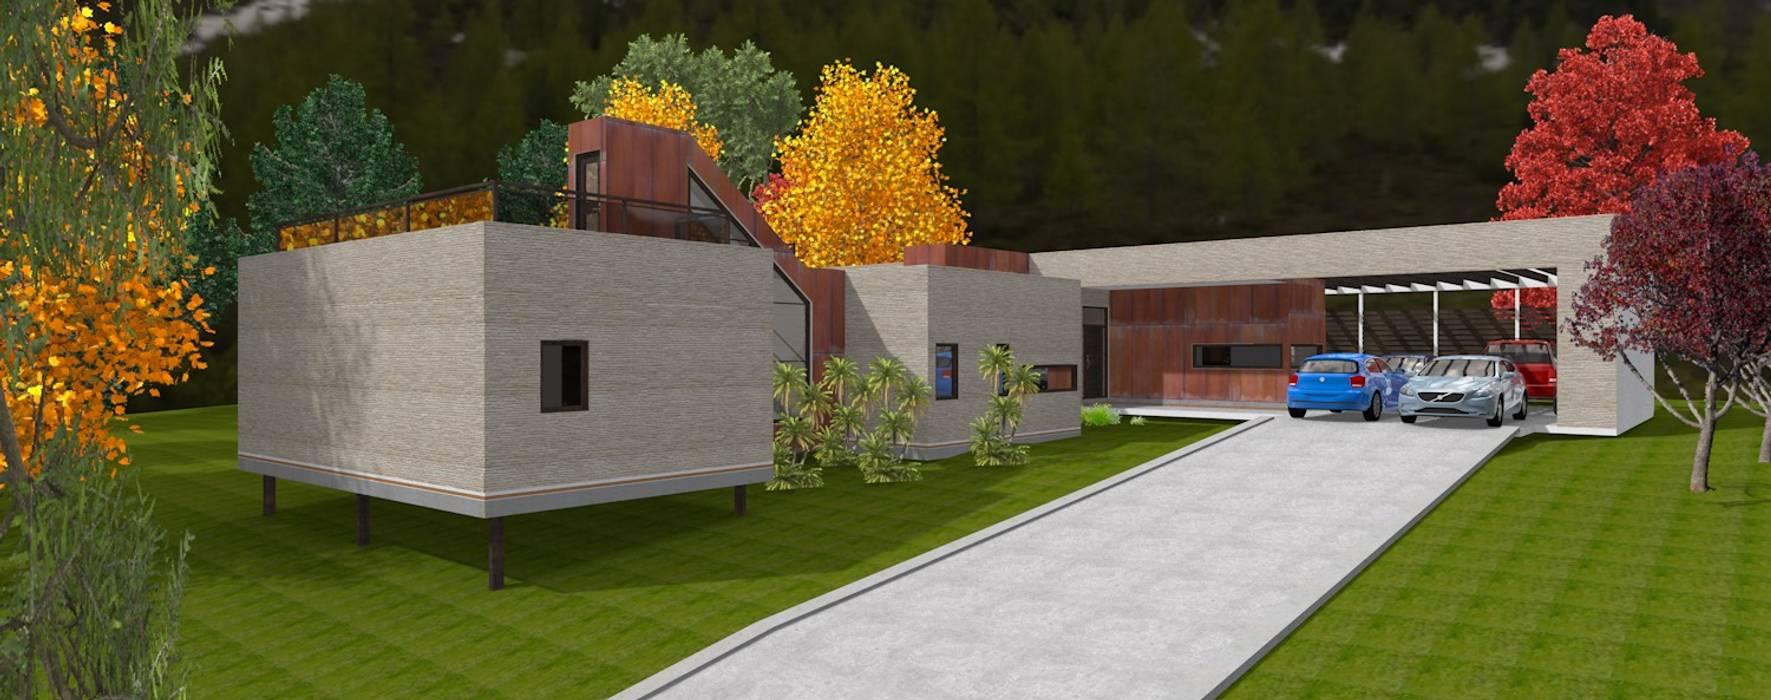 Vista desde aces Casas de estilo escandinavo de ARQvision BIM Sustainable Architecture Escandinavo